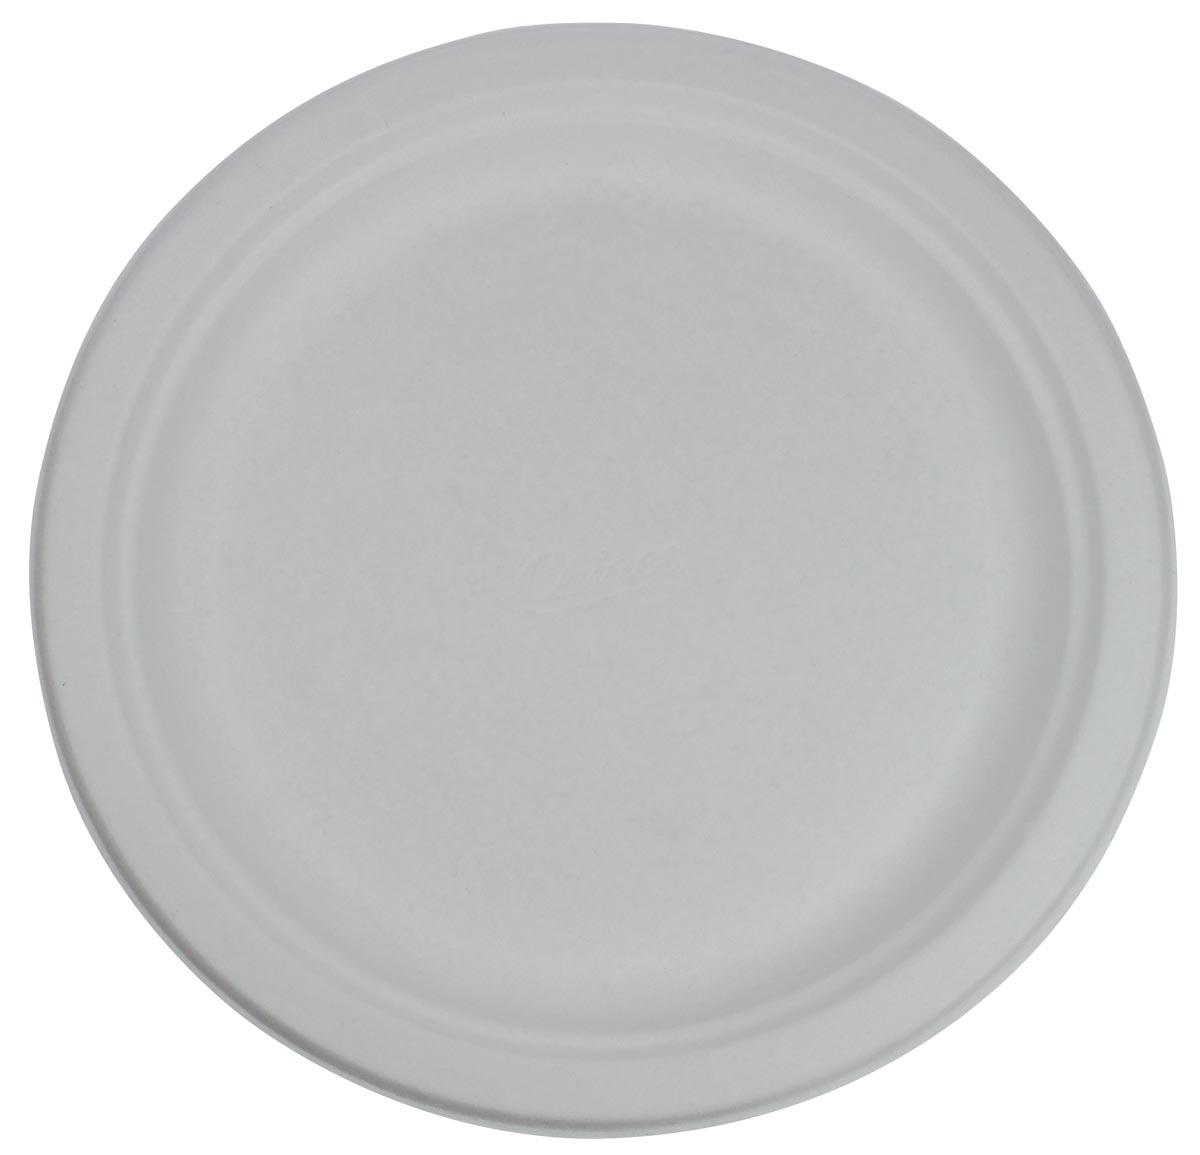 Bord, wit, diameter 24 cm, pak van 100 stuks